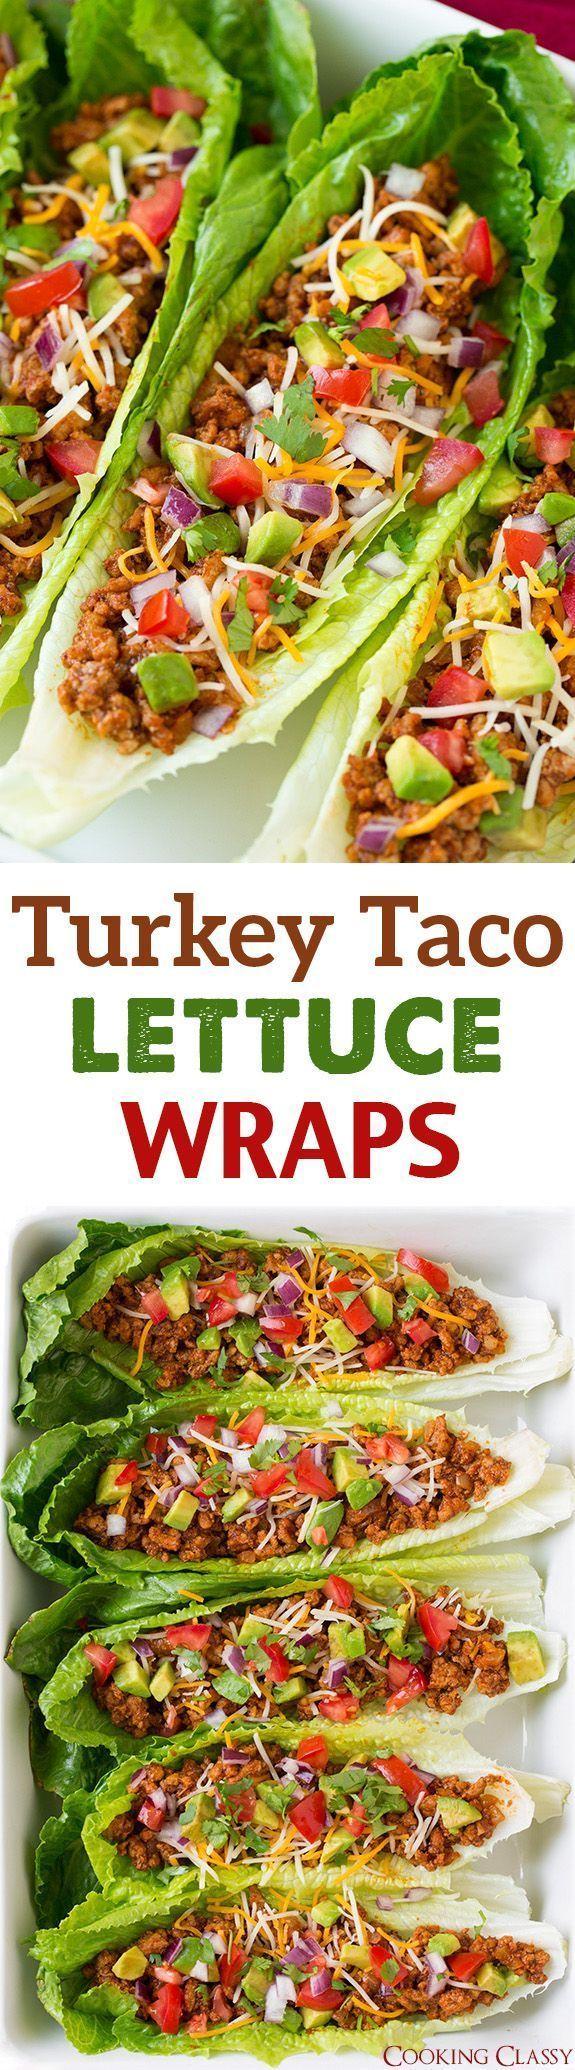 Ground Turkey Tacos en Pinterest | Pavo Molido, Ensaladas De Tacos ...